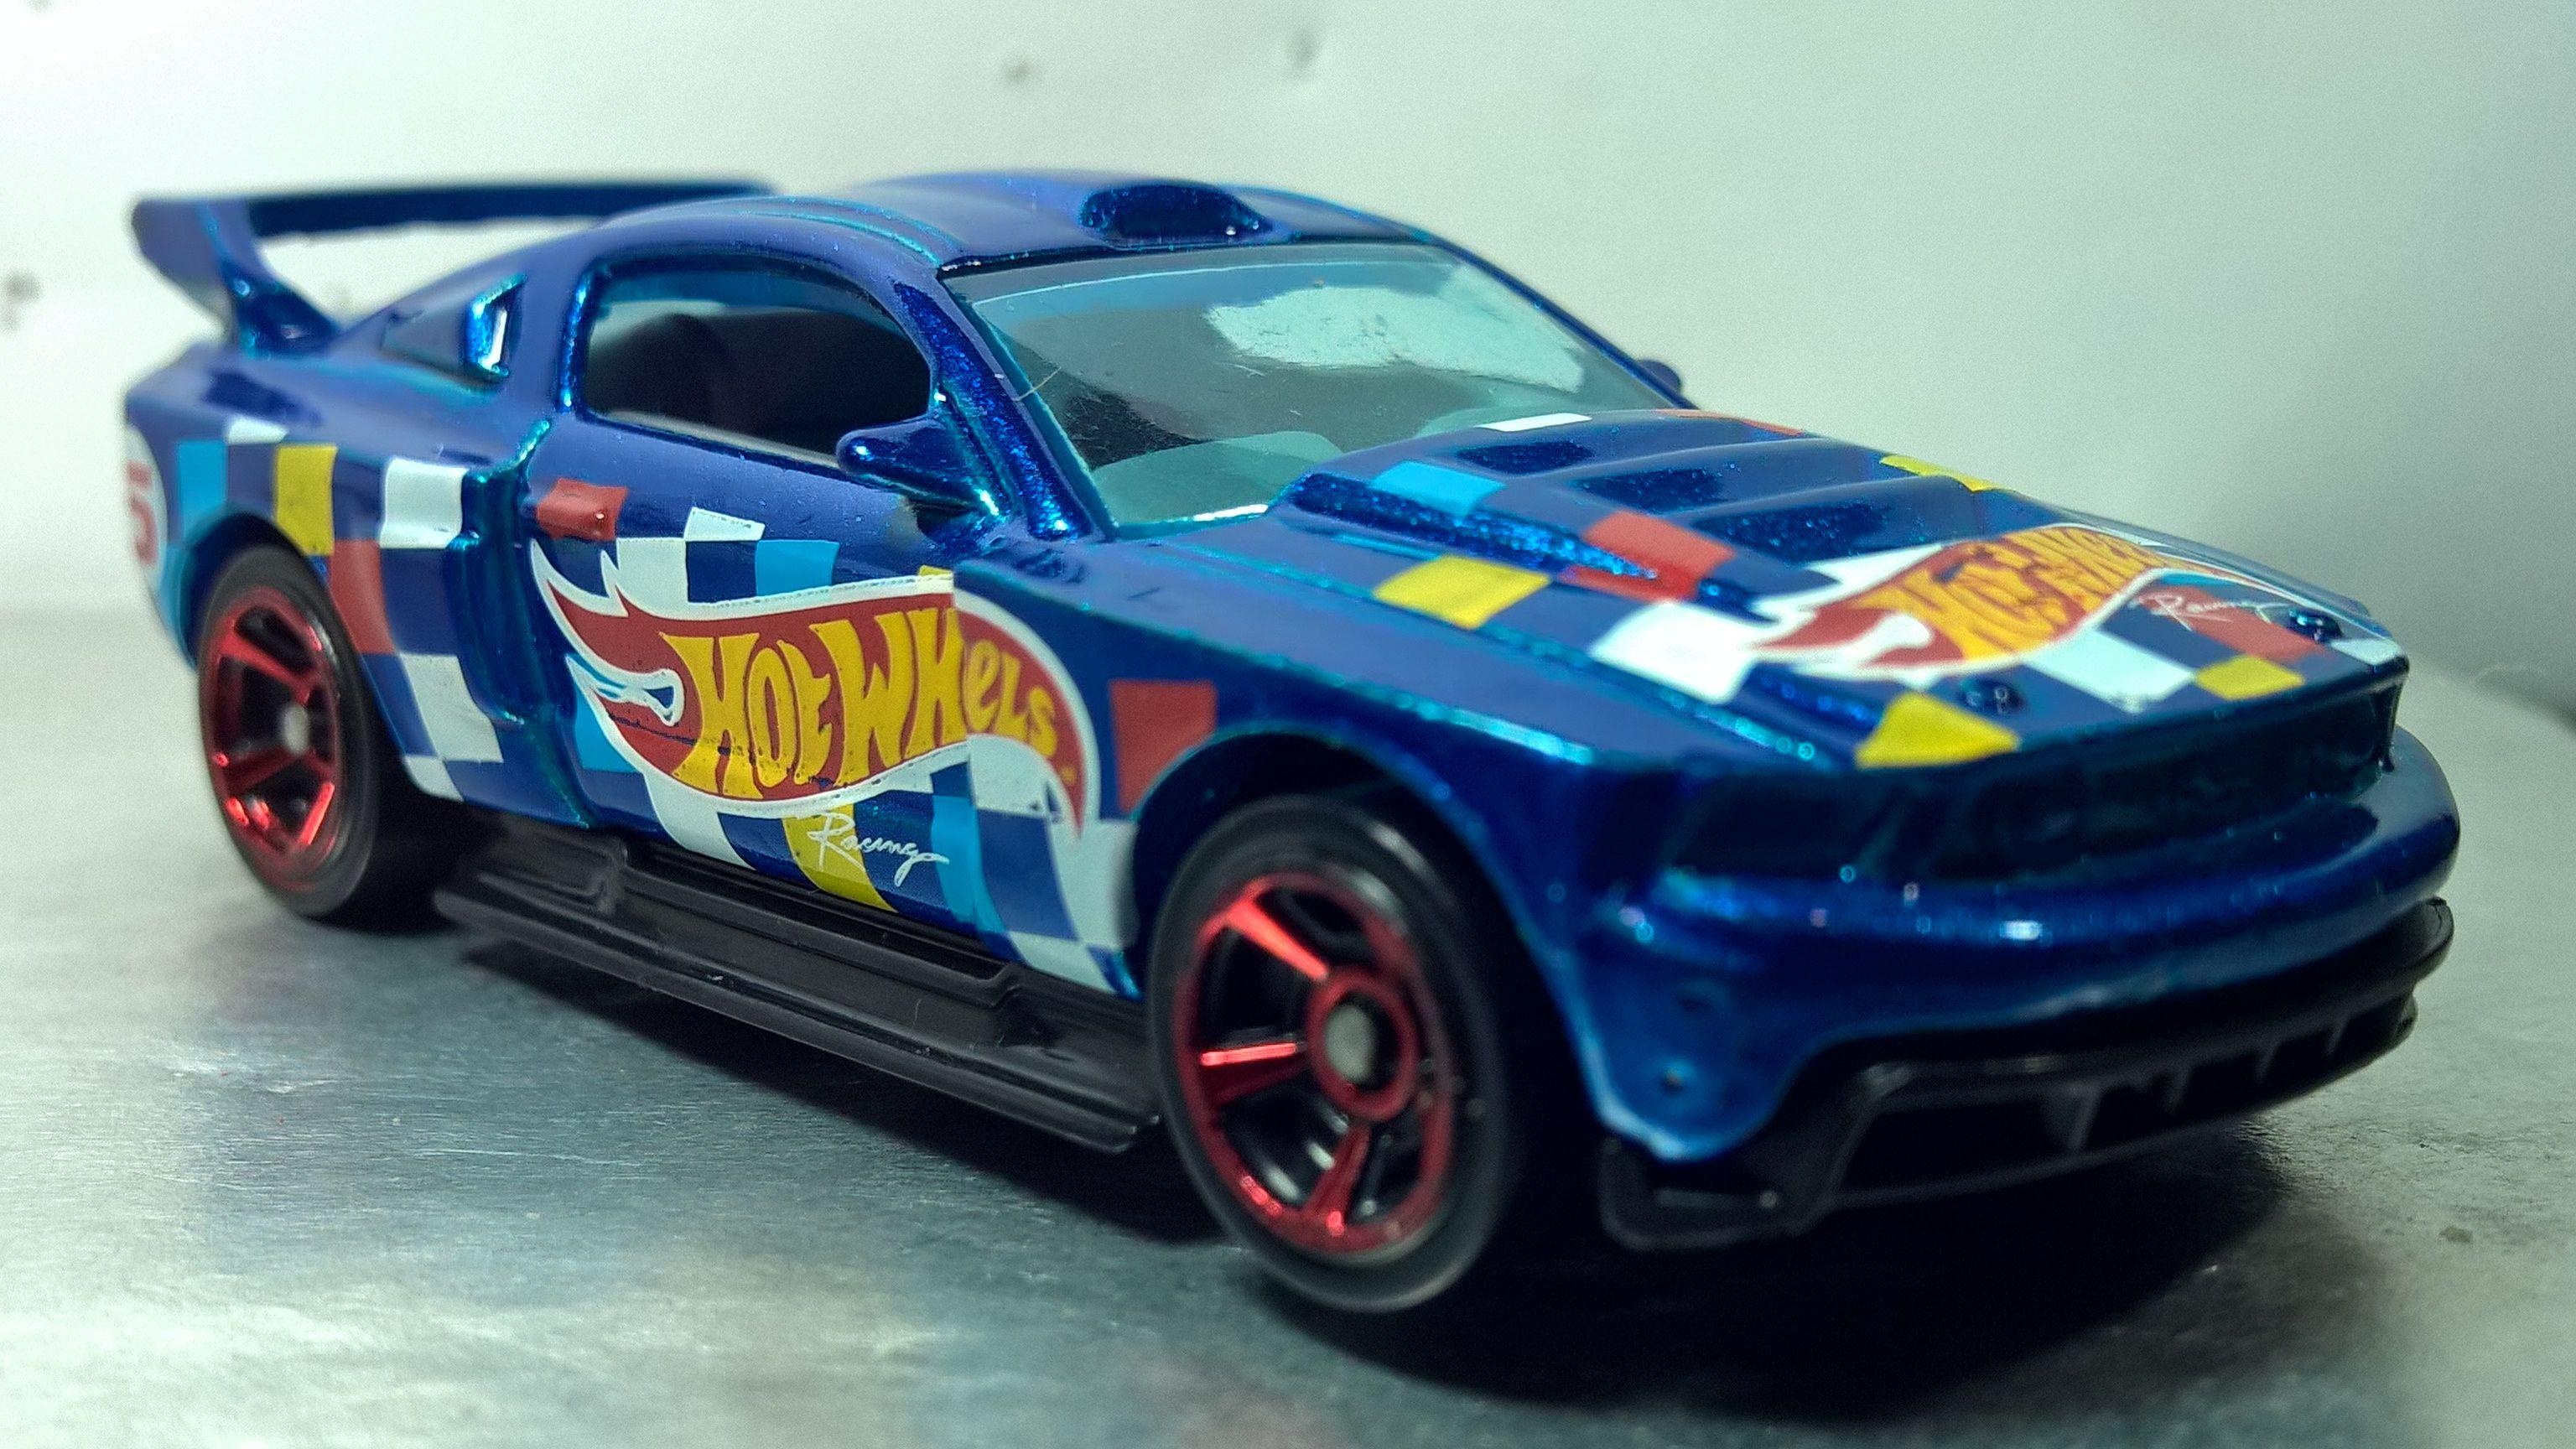 Hot wheels custom 12 ford mustang hw race team 2016